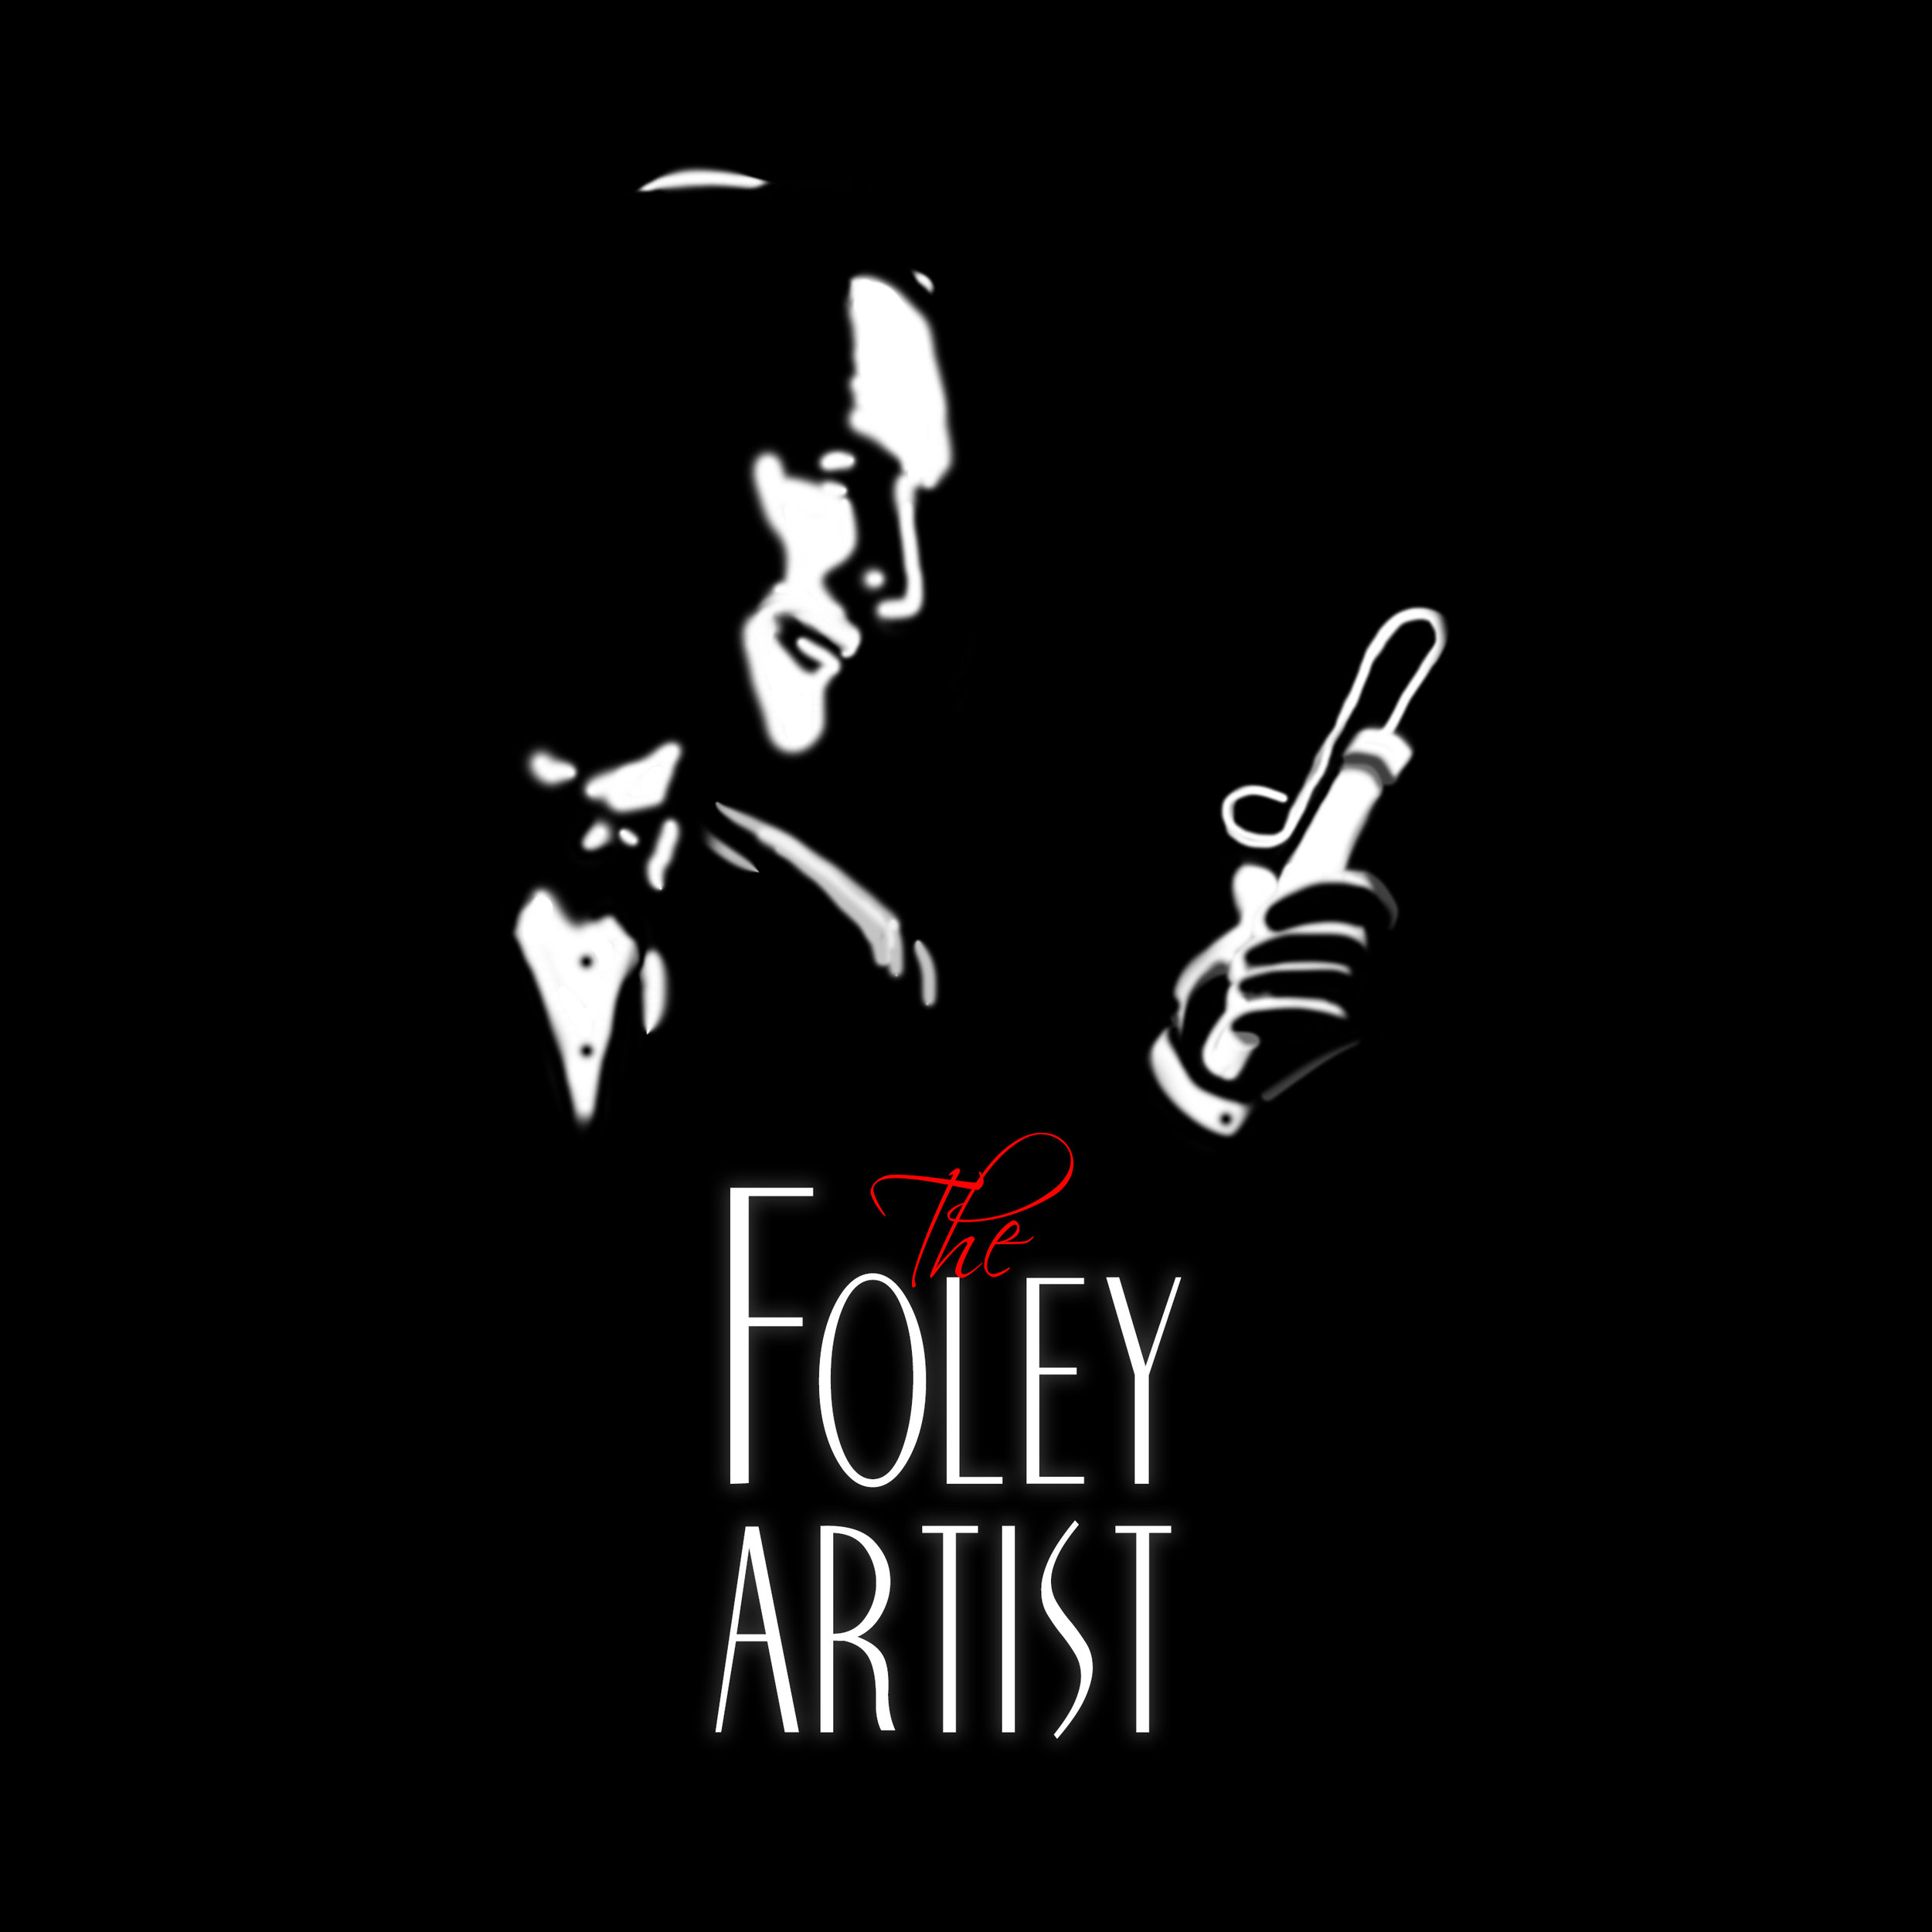 The_Foley_Artist